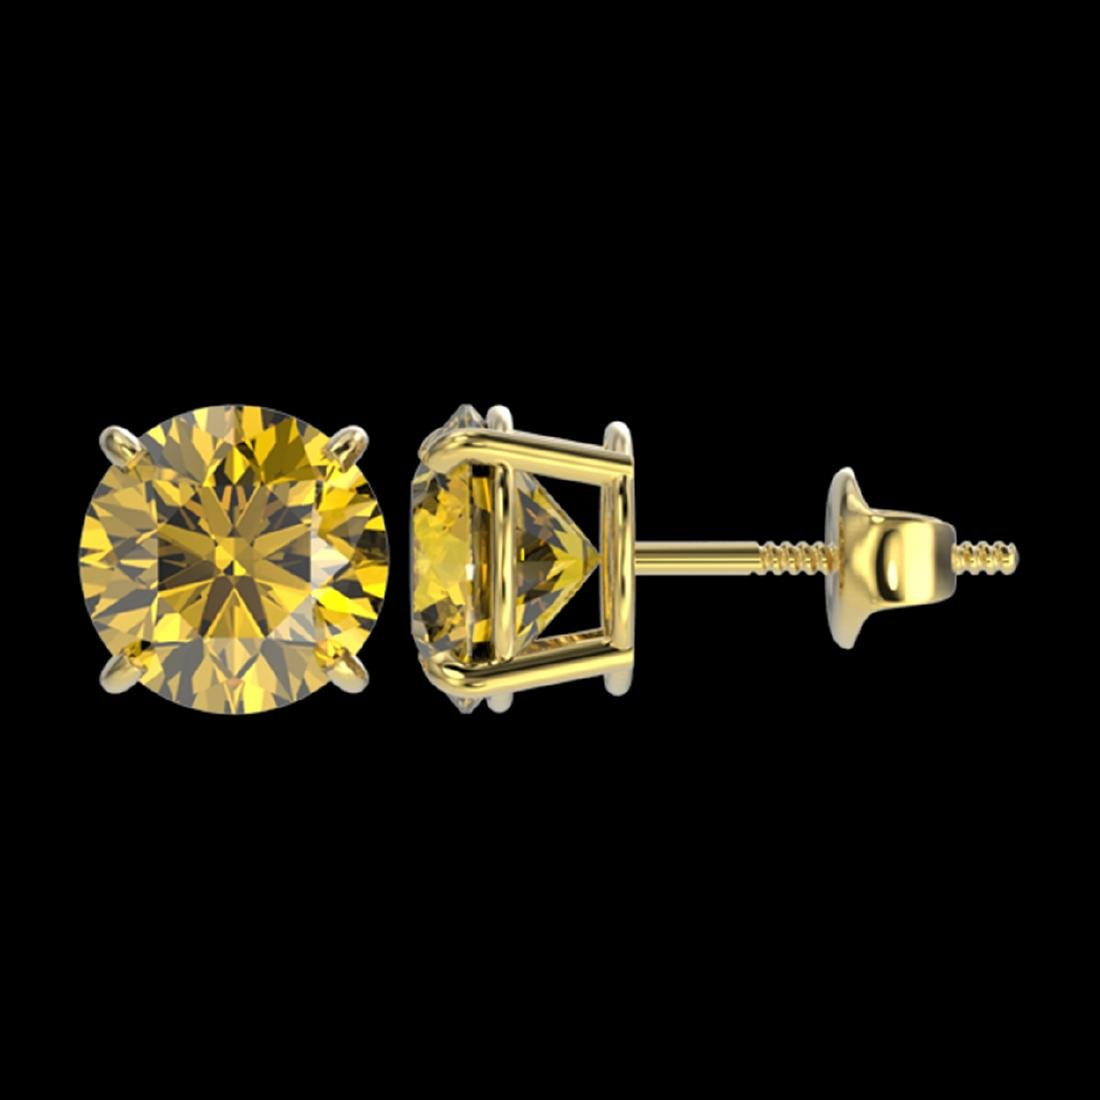 2.57 ctw Intense Yellow Diamond Stud Earrings 10K - 2